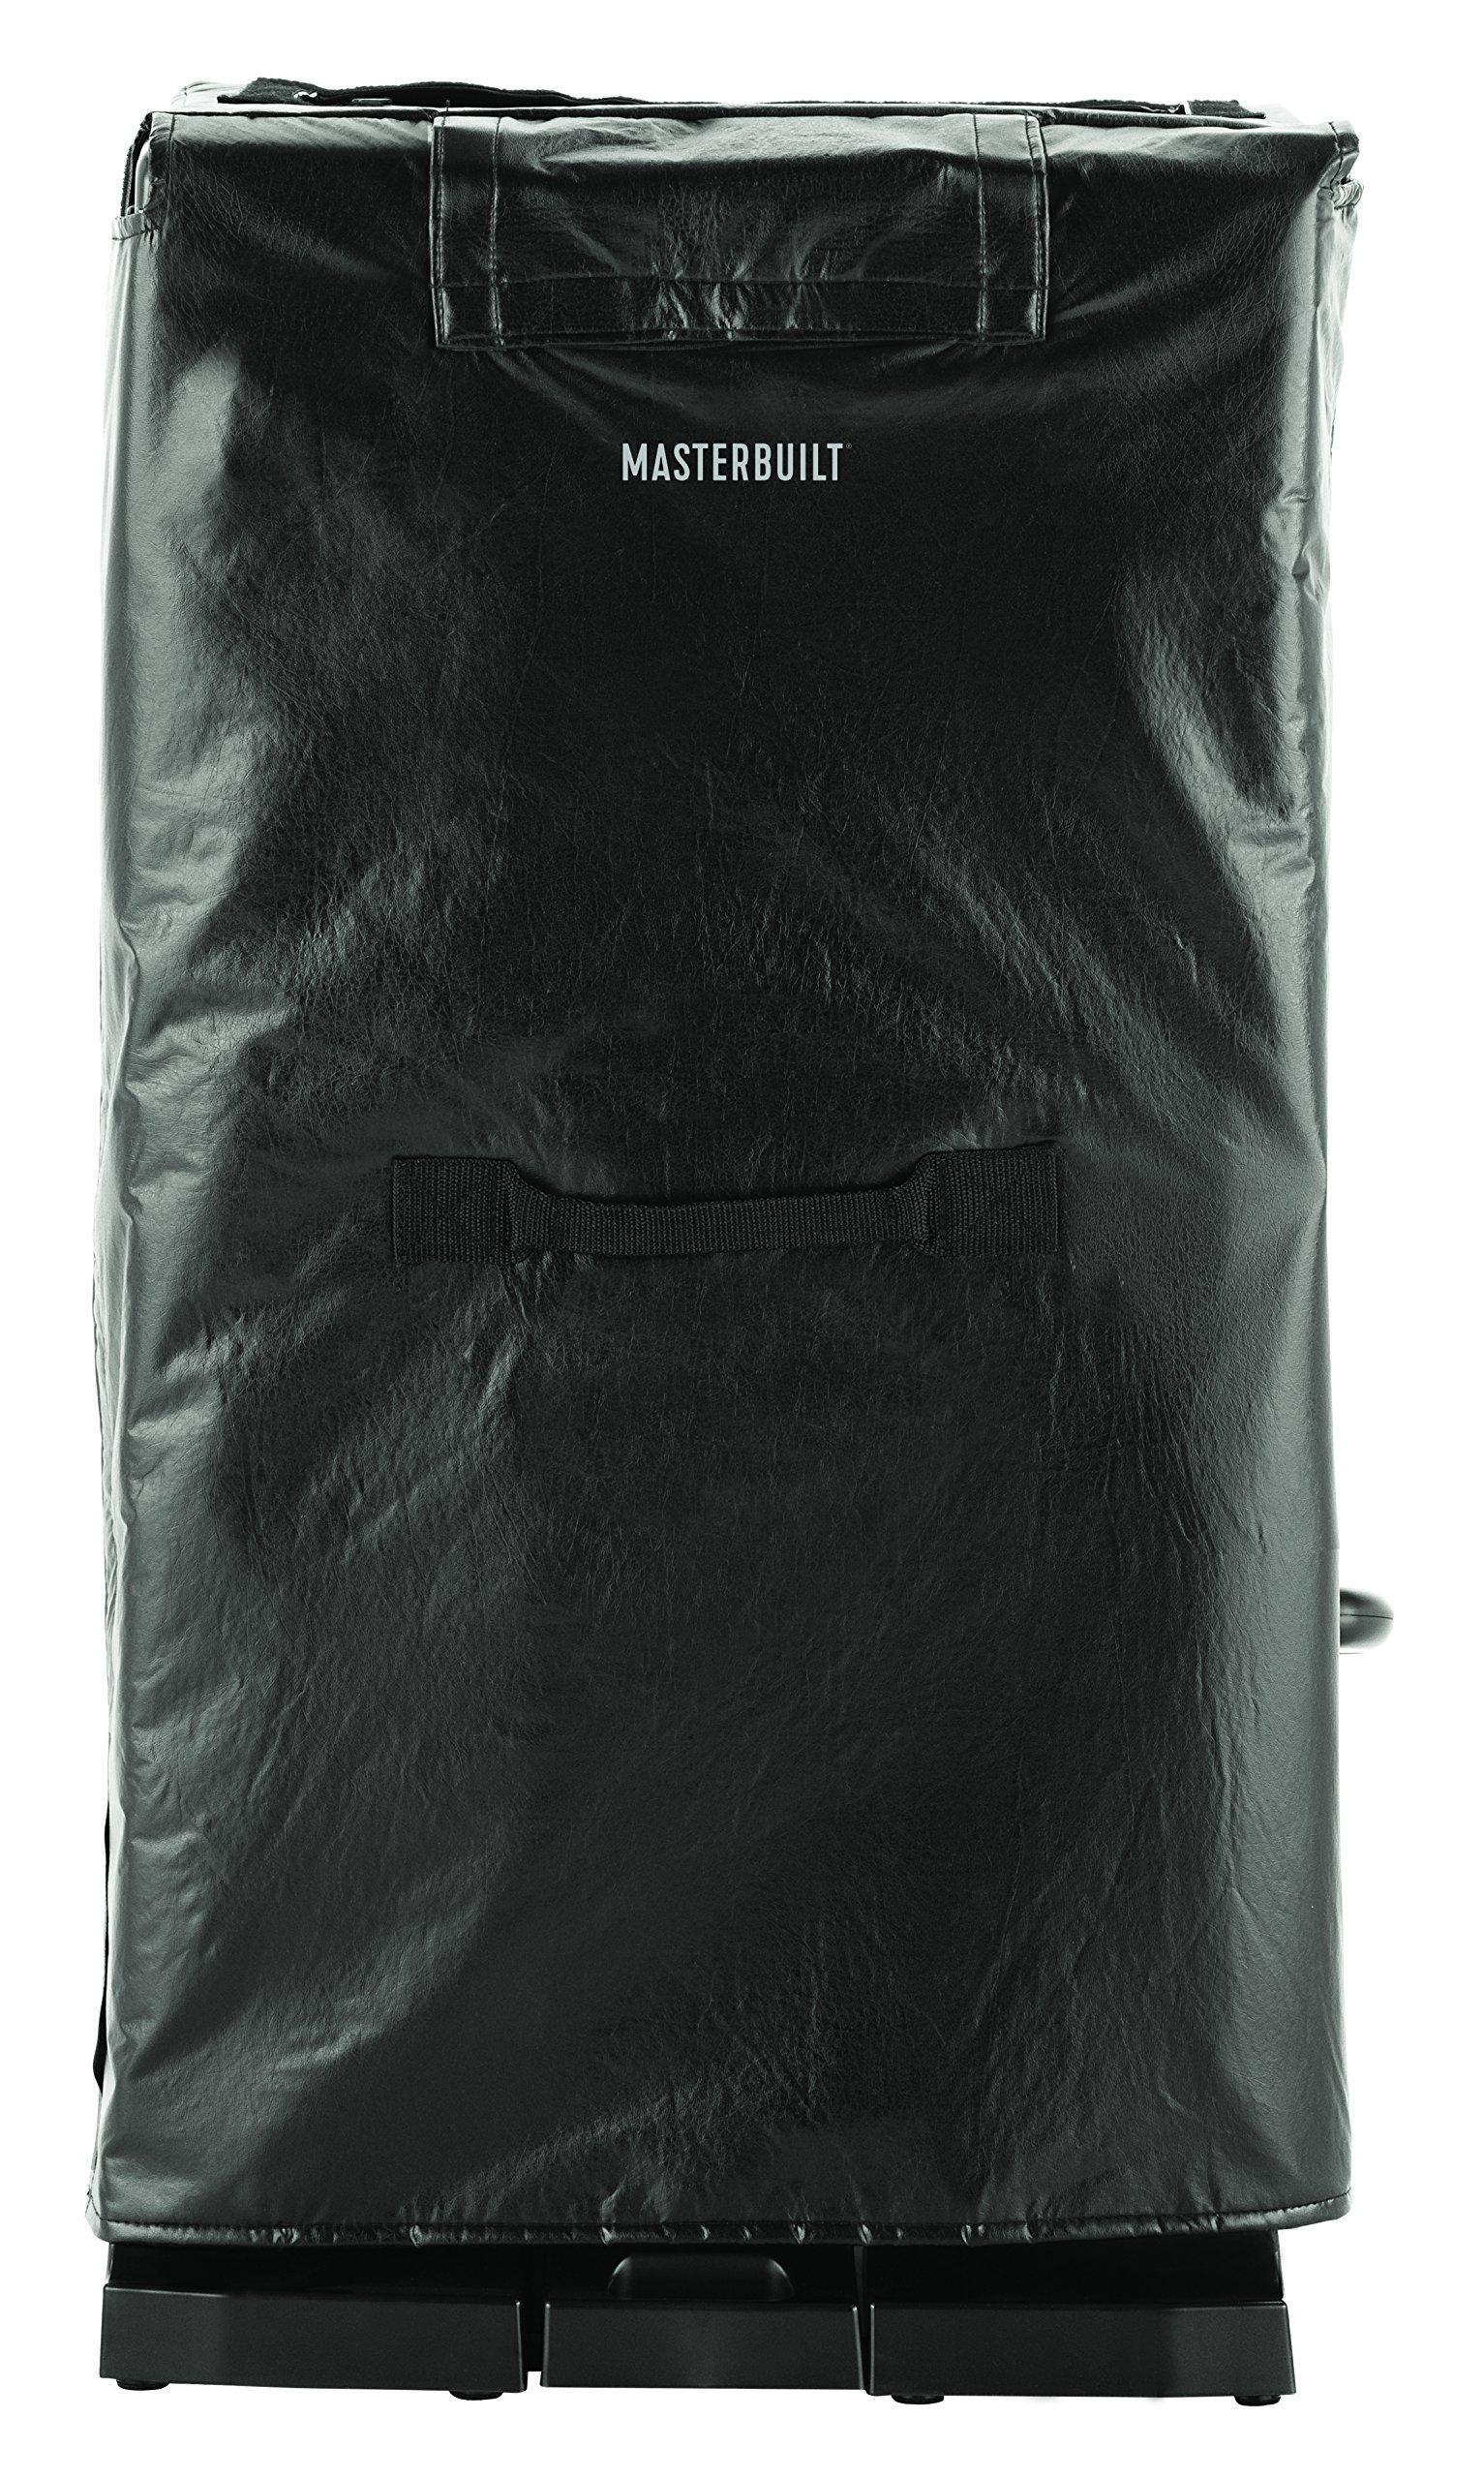 Masterbuilt MB20100513 Smoker Insulation Cover